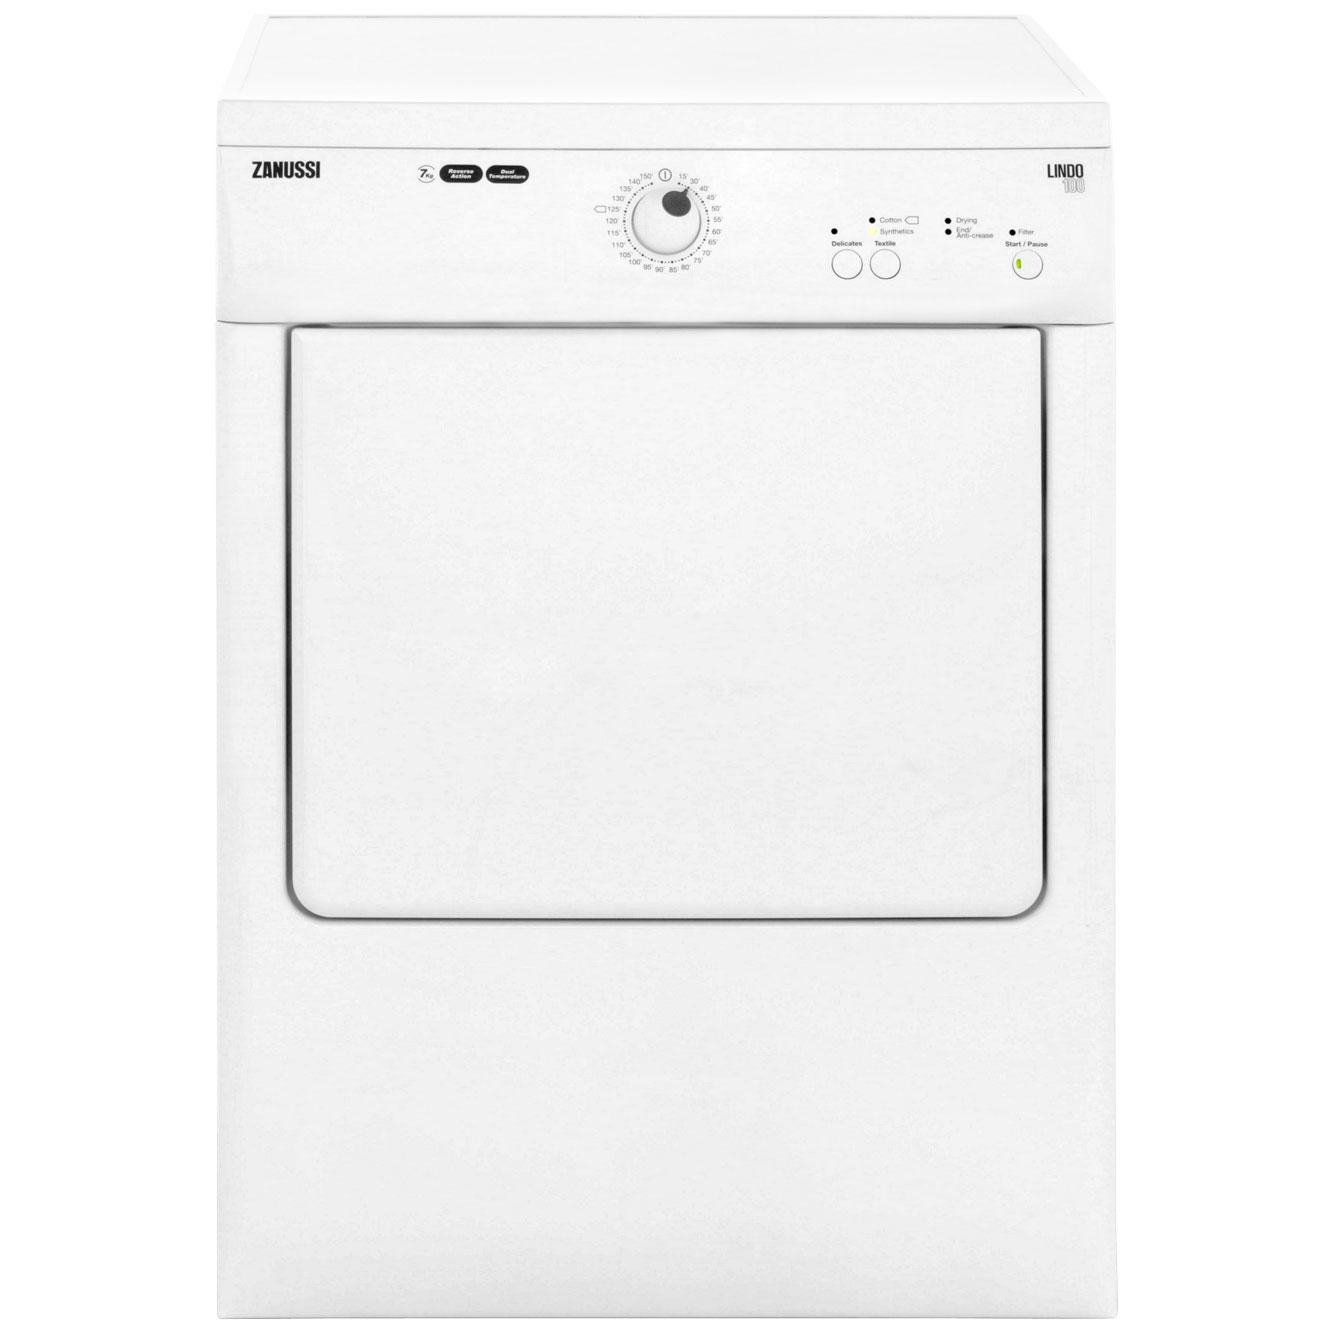 Zanussi Lindo100 ZTE7100PZ Free Standing Vented Tumble Dryer in White